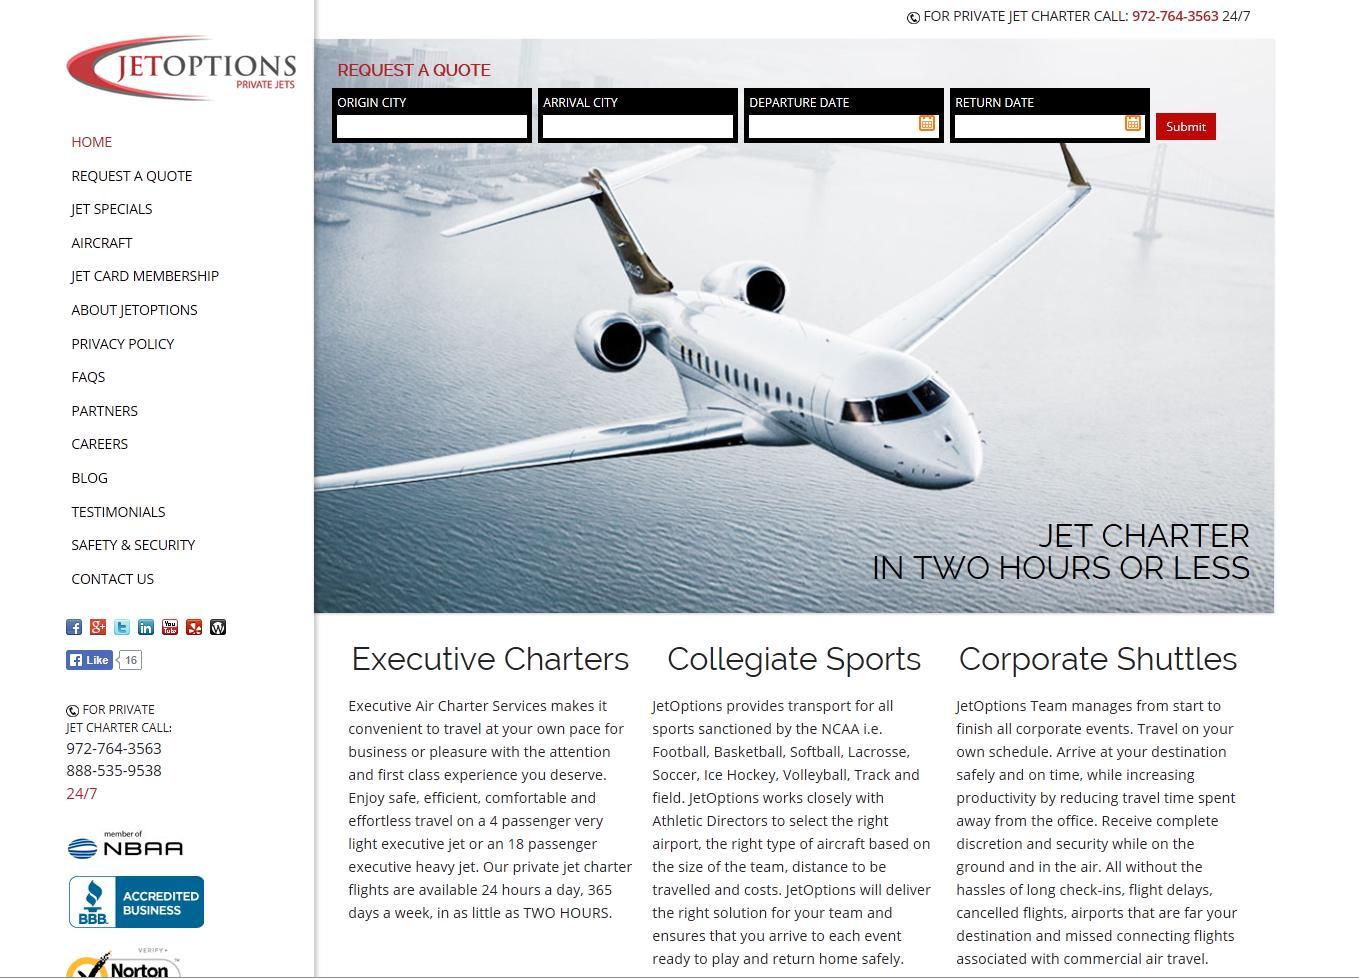 JetOptions redesigns website